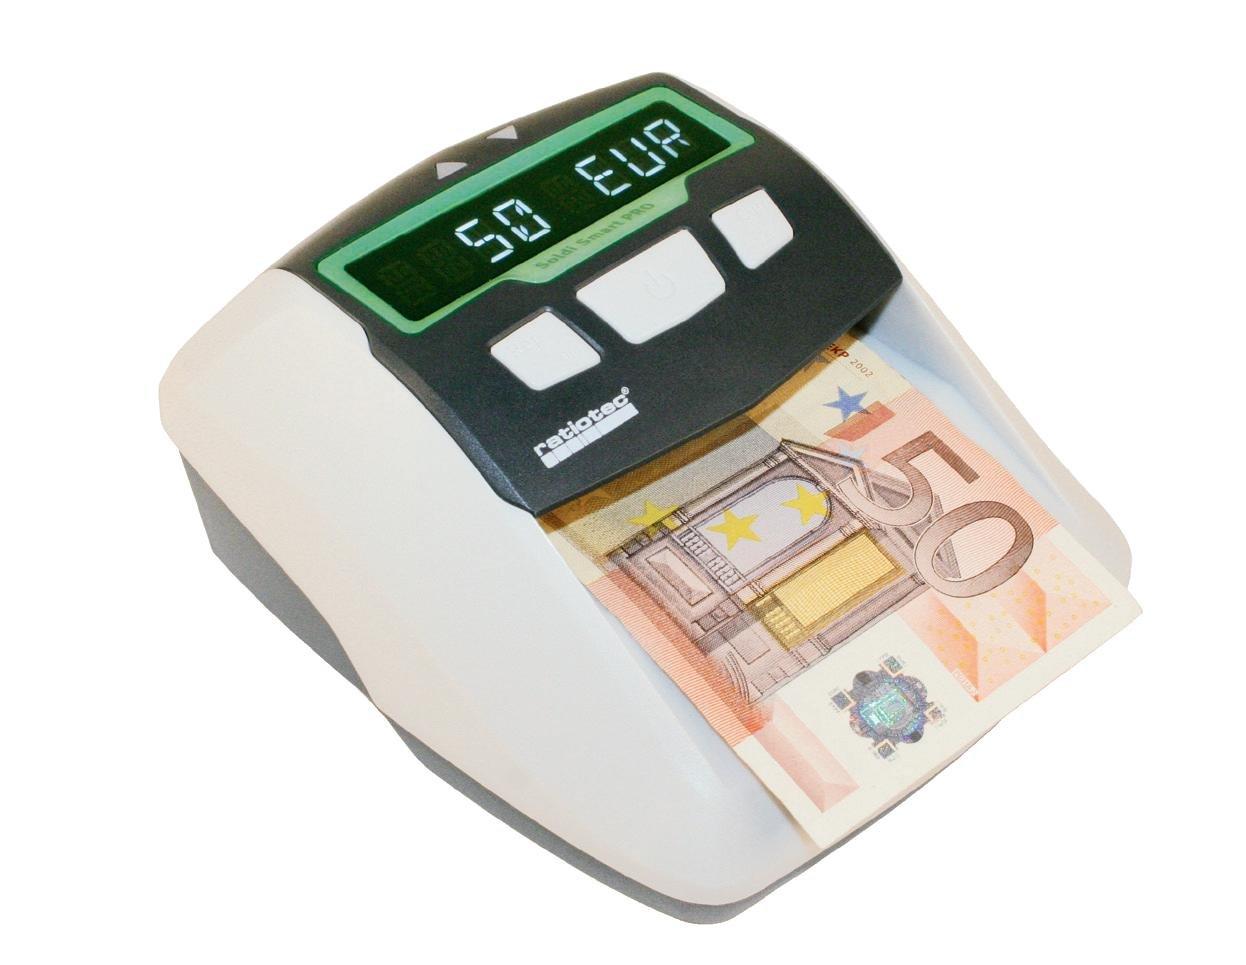 ratiotec Soldi Smart Pro 64480